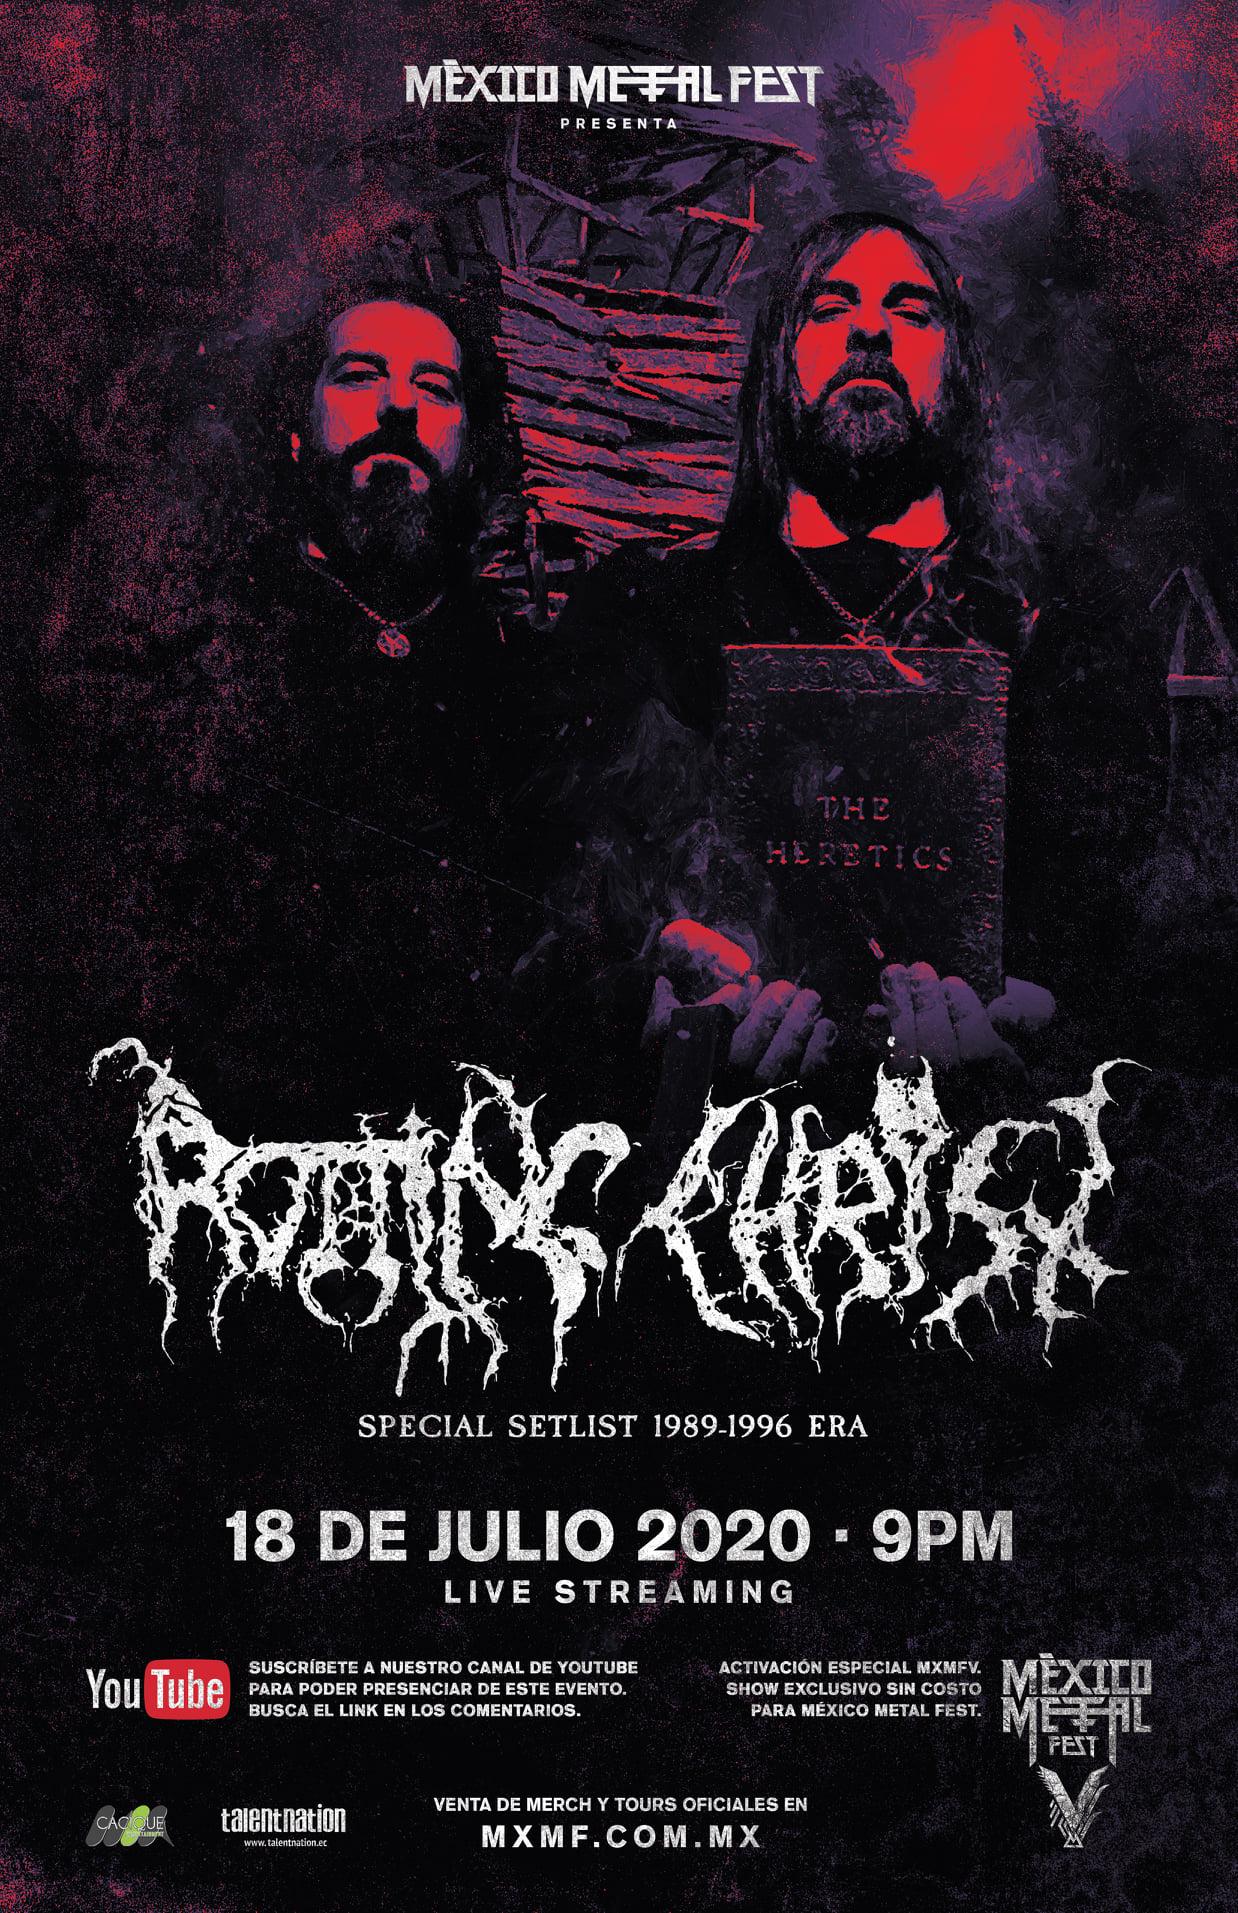 rotting christ mexico metal fest